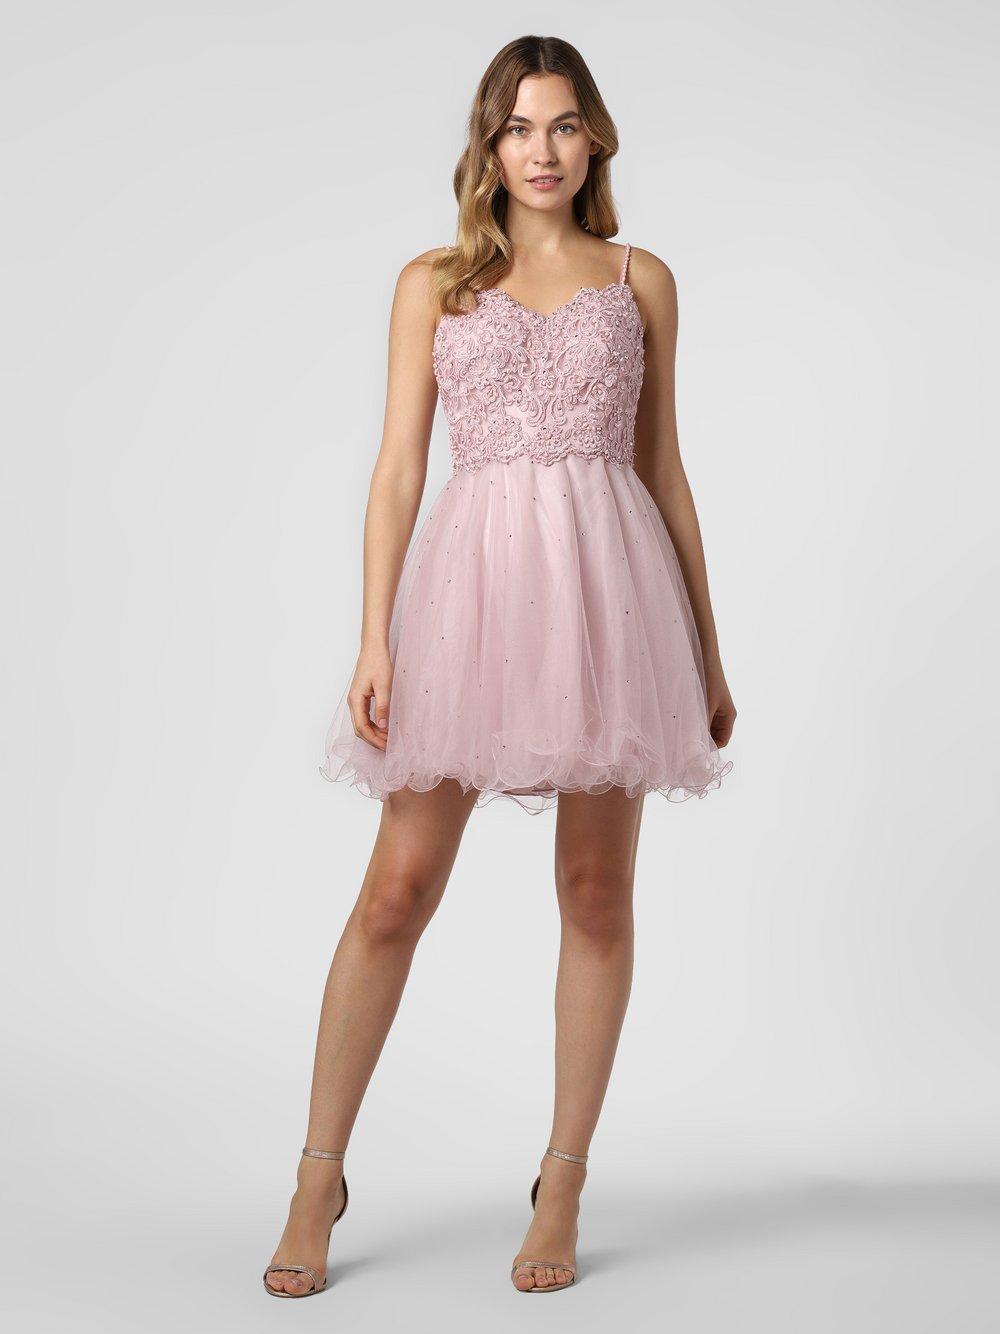 Laona – Damska sukienka wieczorowa, różowy Van Graaf 466895-0001-00380